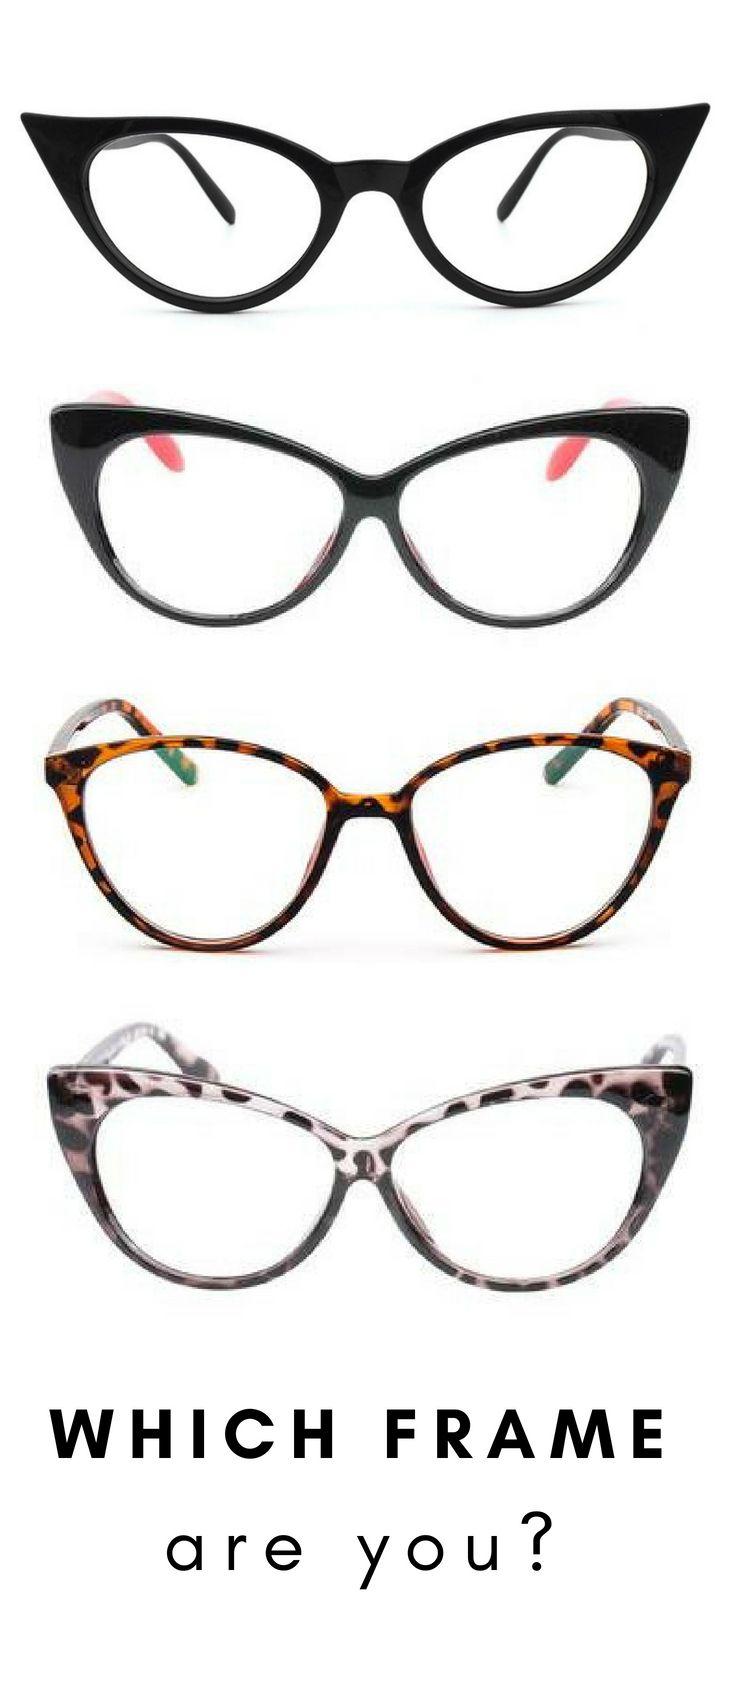 a9e064ecd1b3 FREE GIVEAWAY Dealistas Cat Eye Glasses cat eye glasses cat eye cat eye  sunglasses cat lovers eyewear vouge glasses frames for women glasses frames  glasses ...